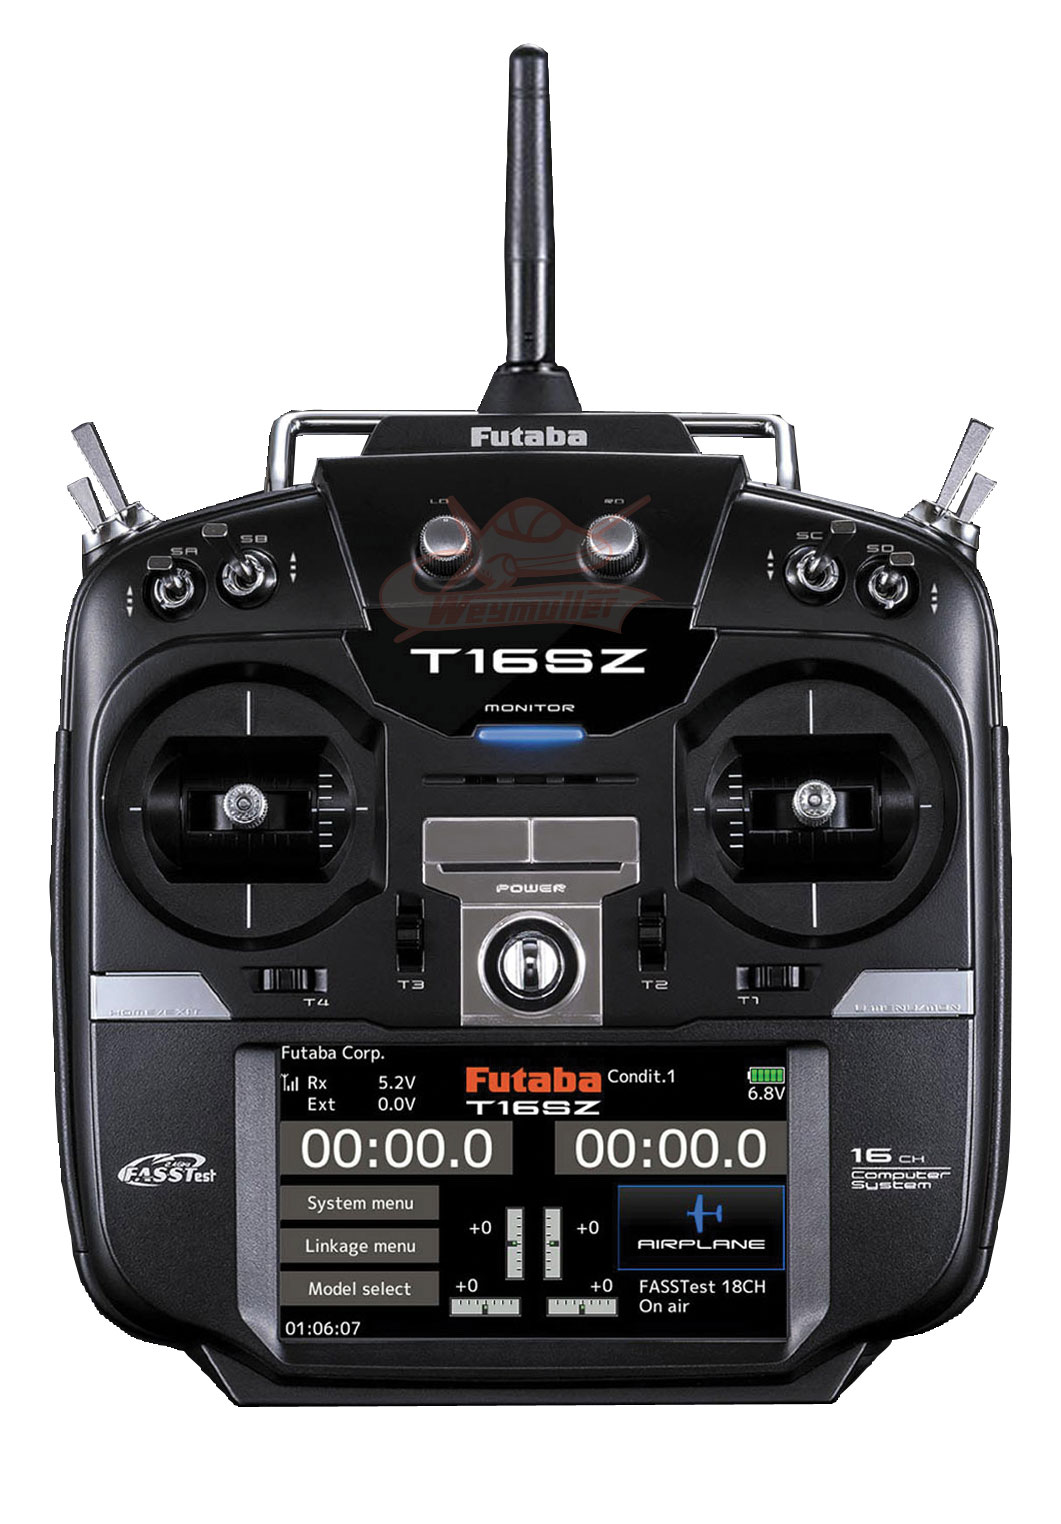 Radio Futaba 16SZ 2,4GHz 16/8/0 accu Tx + chargeur Tx. Mode 1